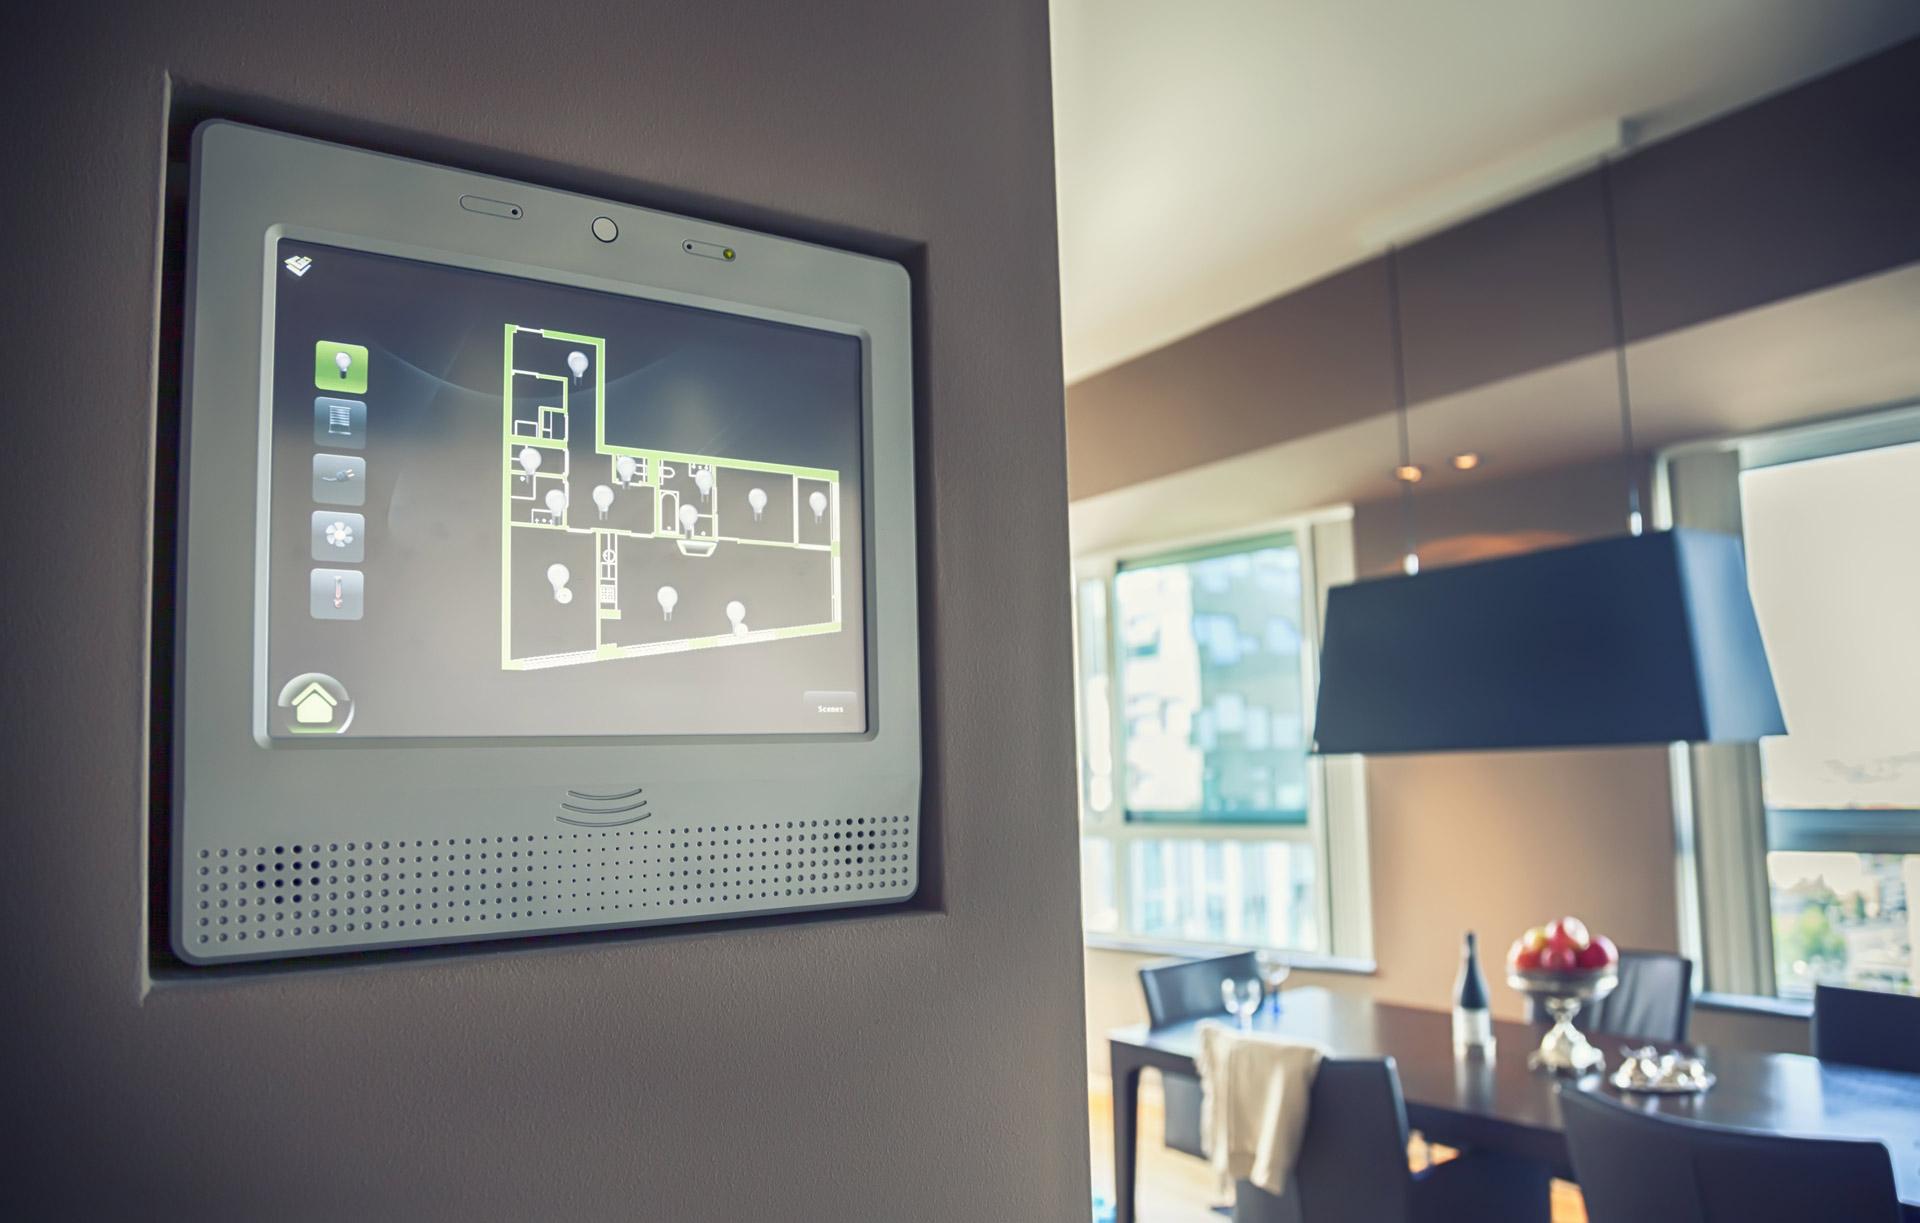 Sistemas AV - Hi End -  Equipos Audiovisuales de gama alta - 2